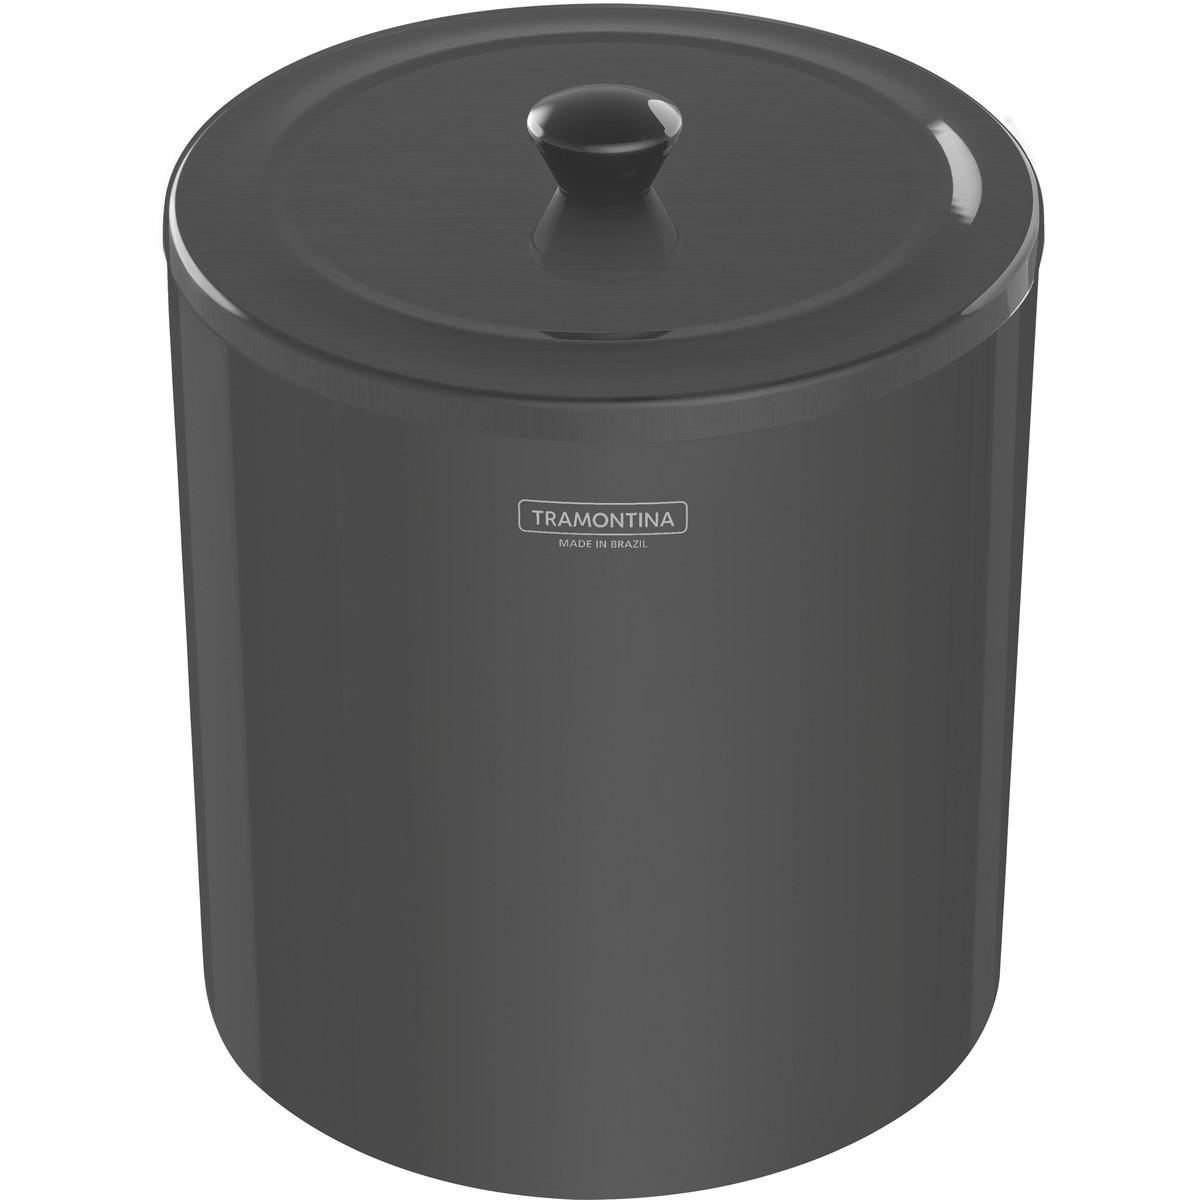 Lixeira Tramontina Útil Aço Inox Polido Black 5L